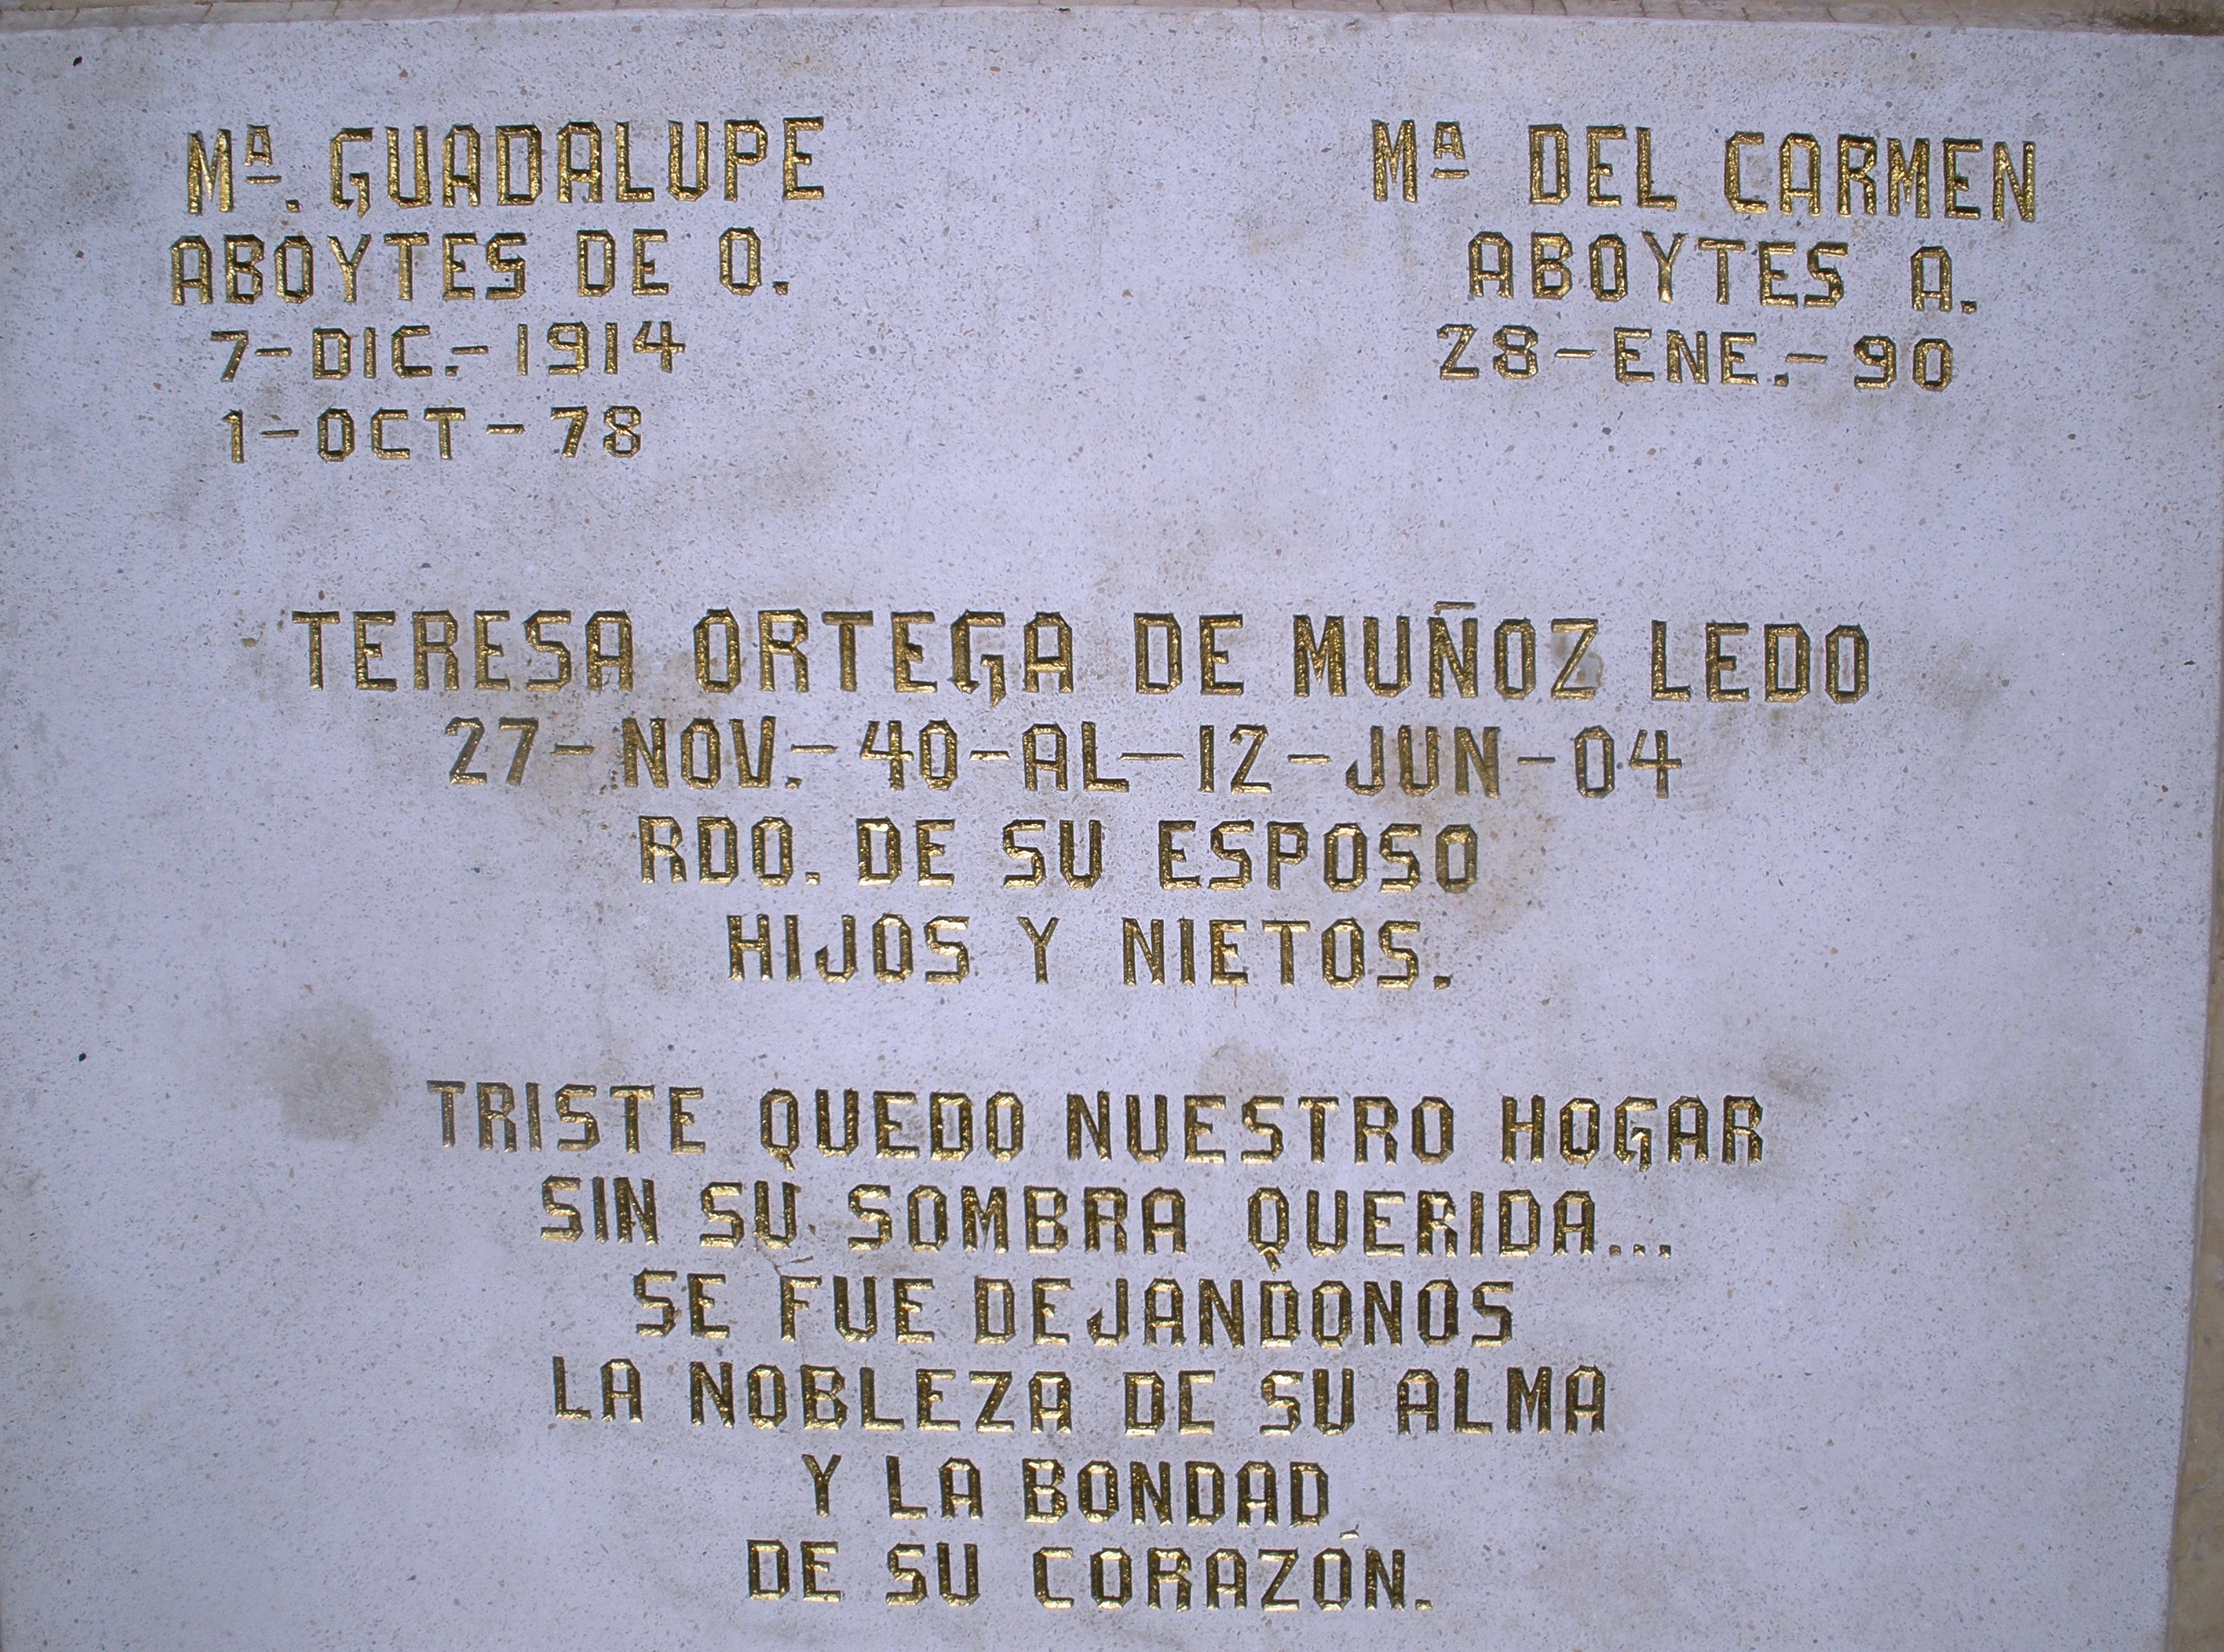 Maria Guadalupe Aboytes de O